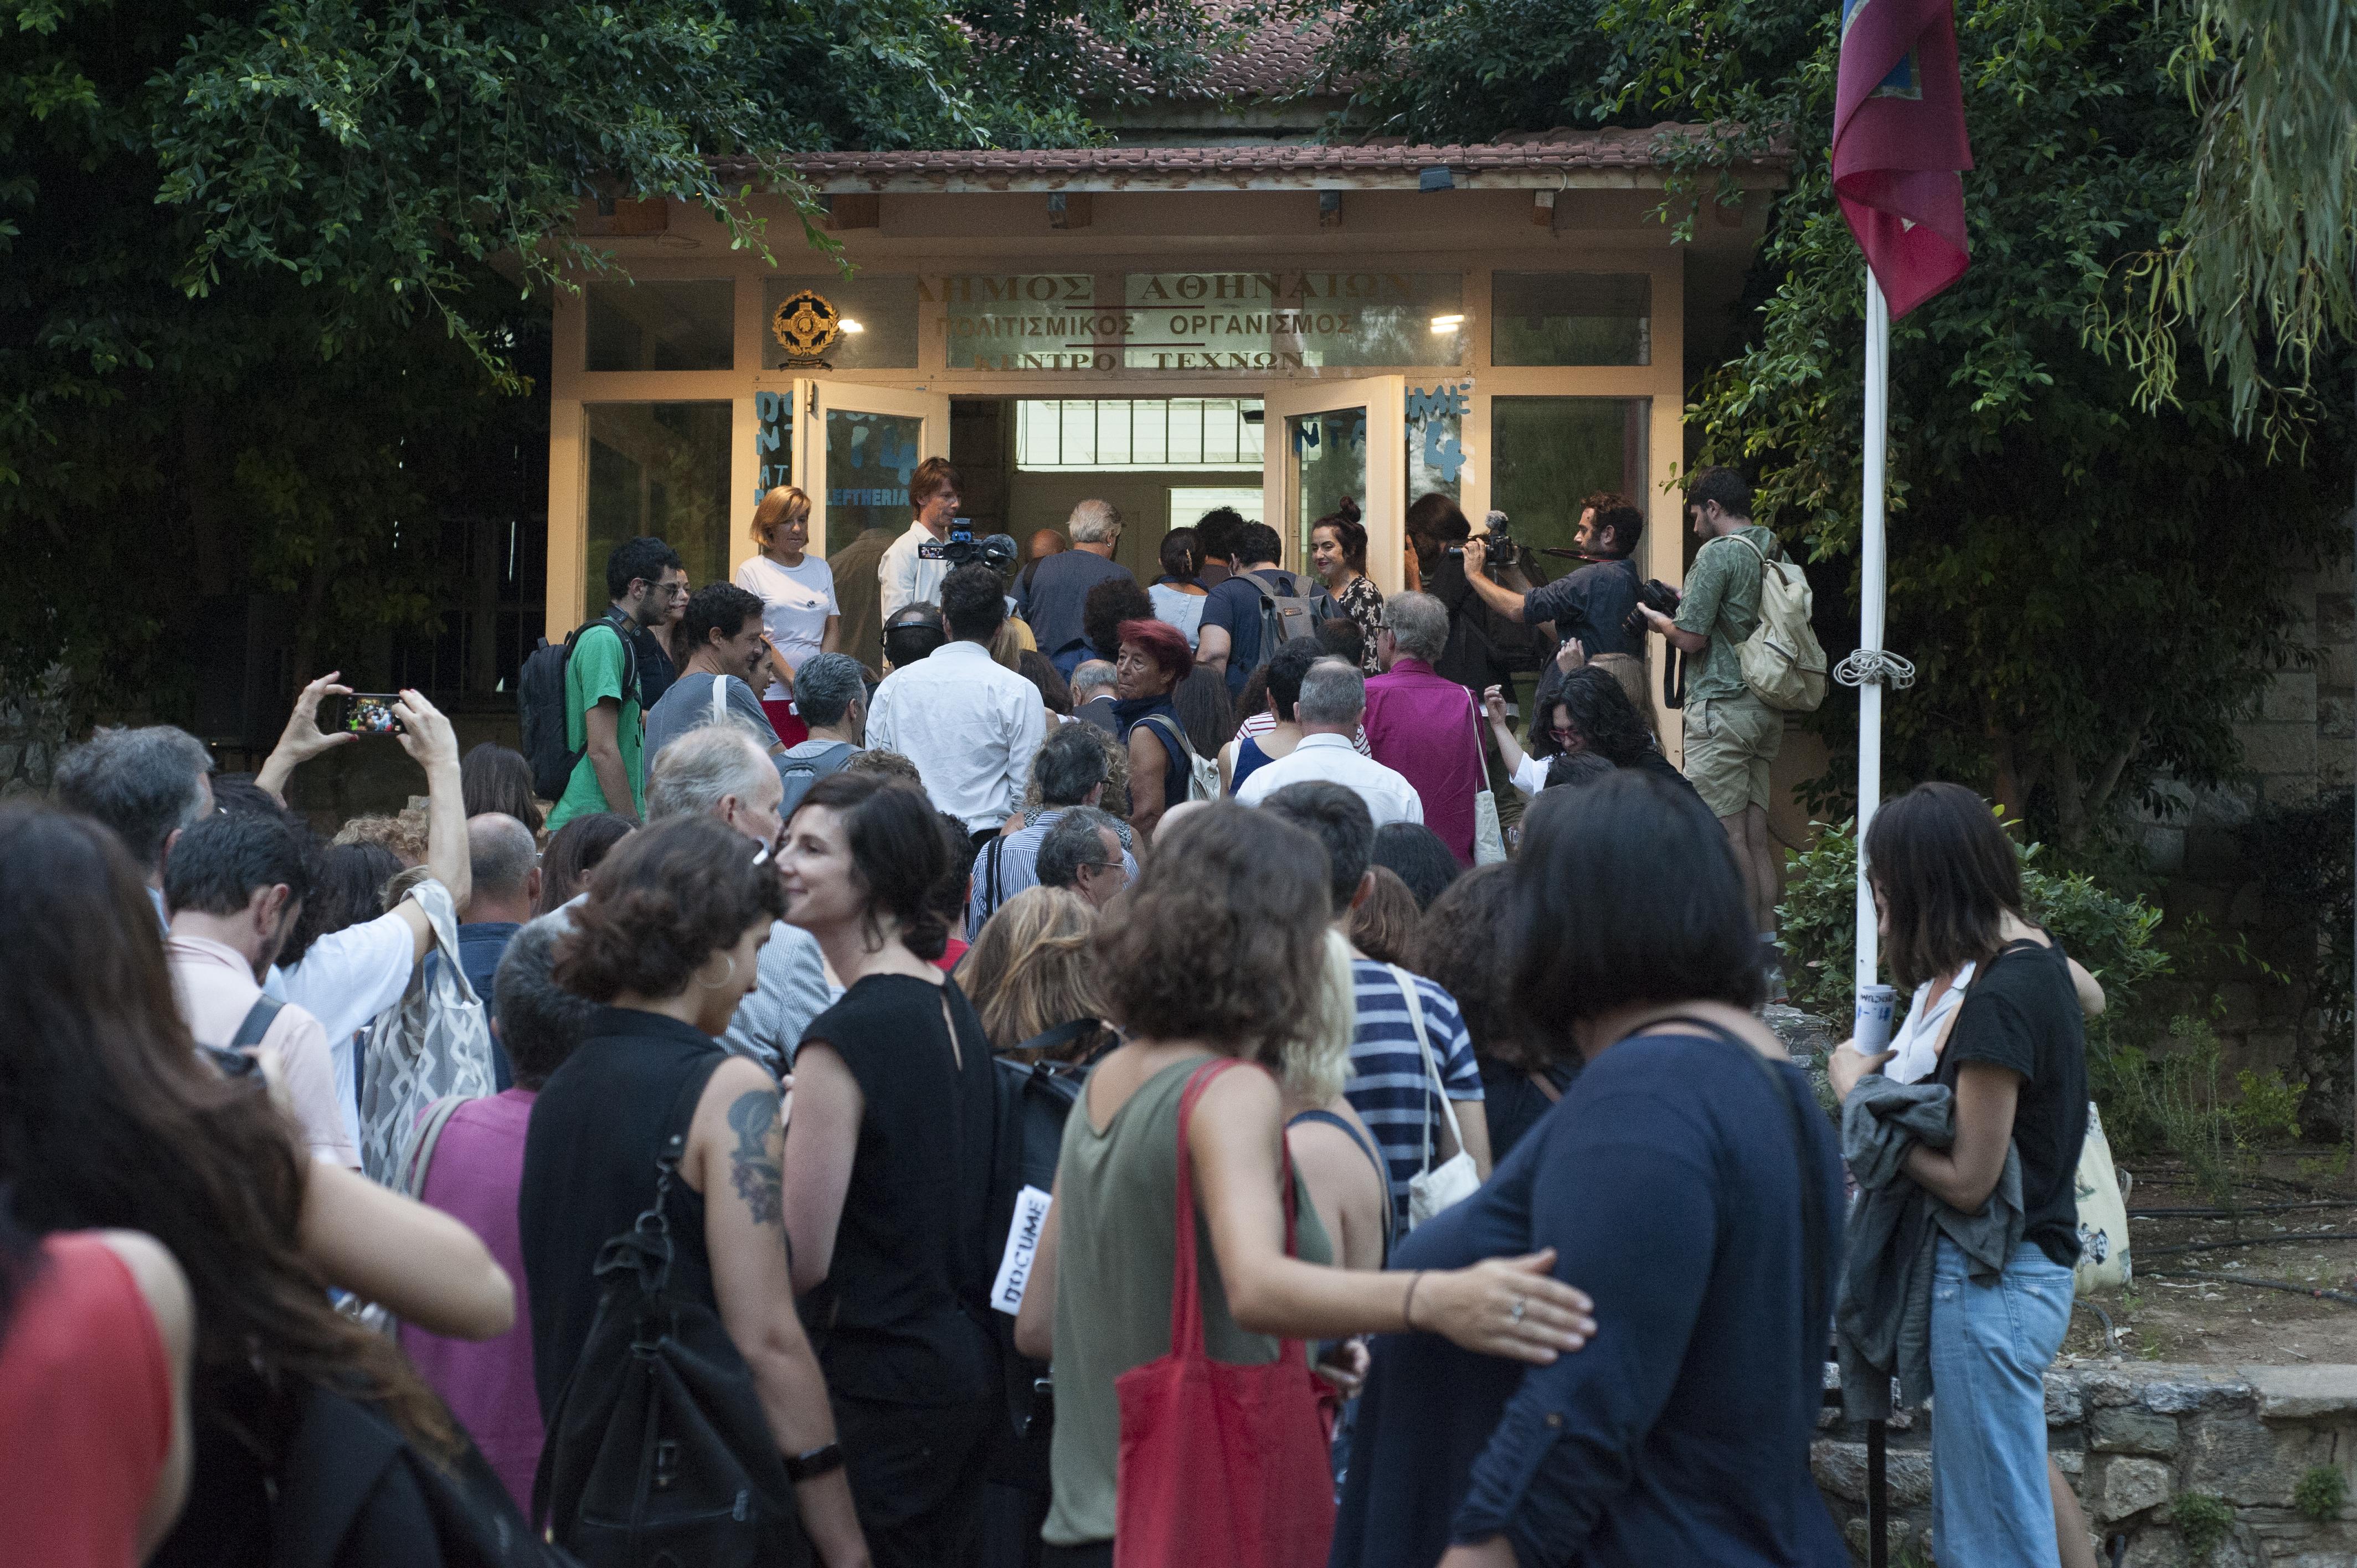 A group of people attending documenta 14's public program